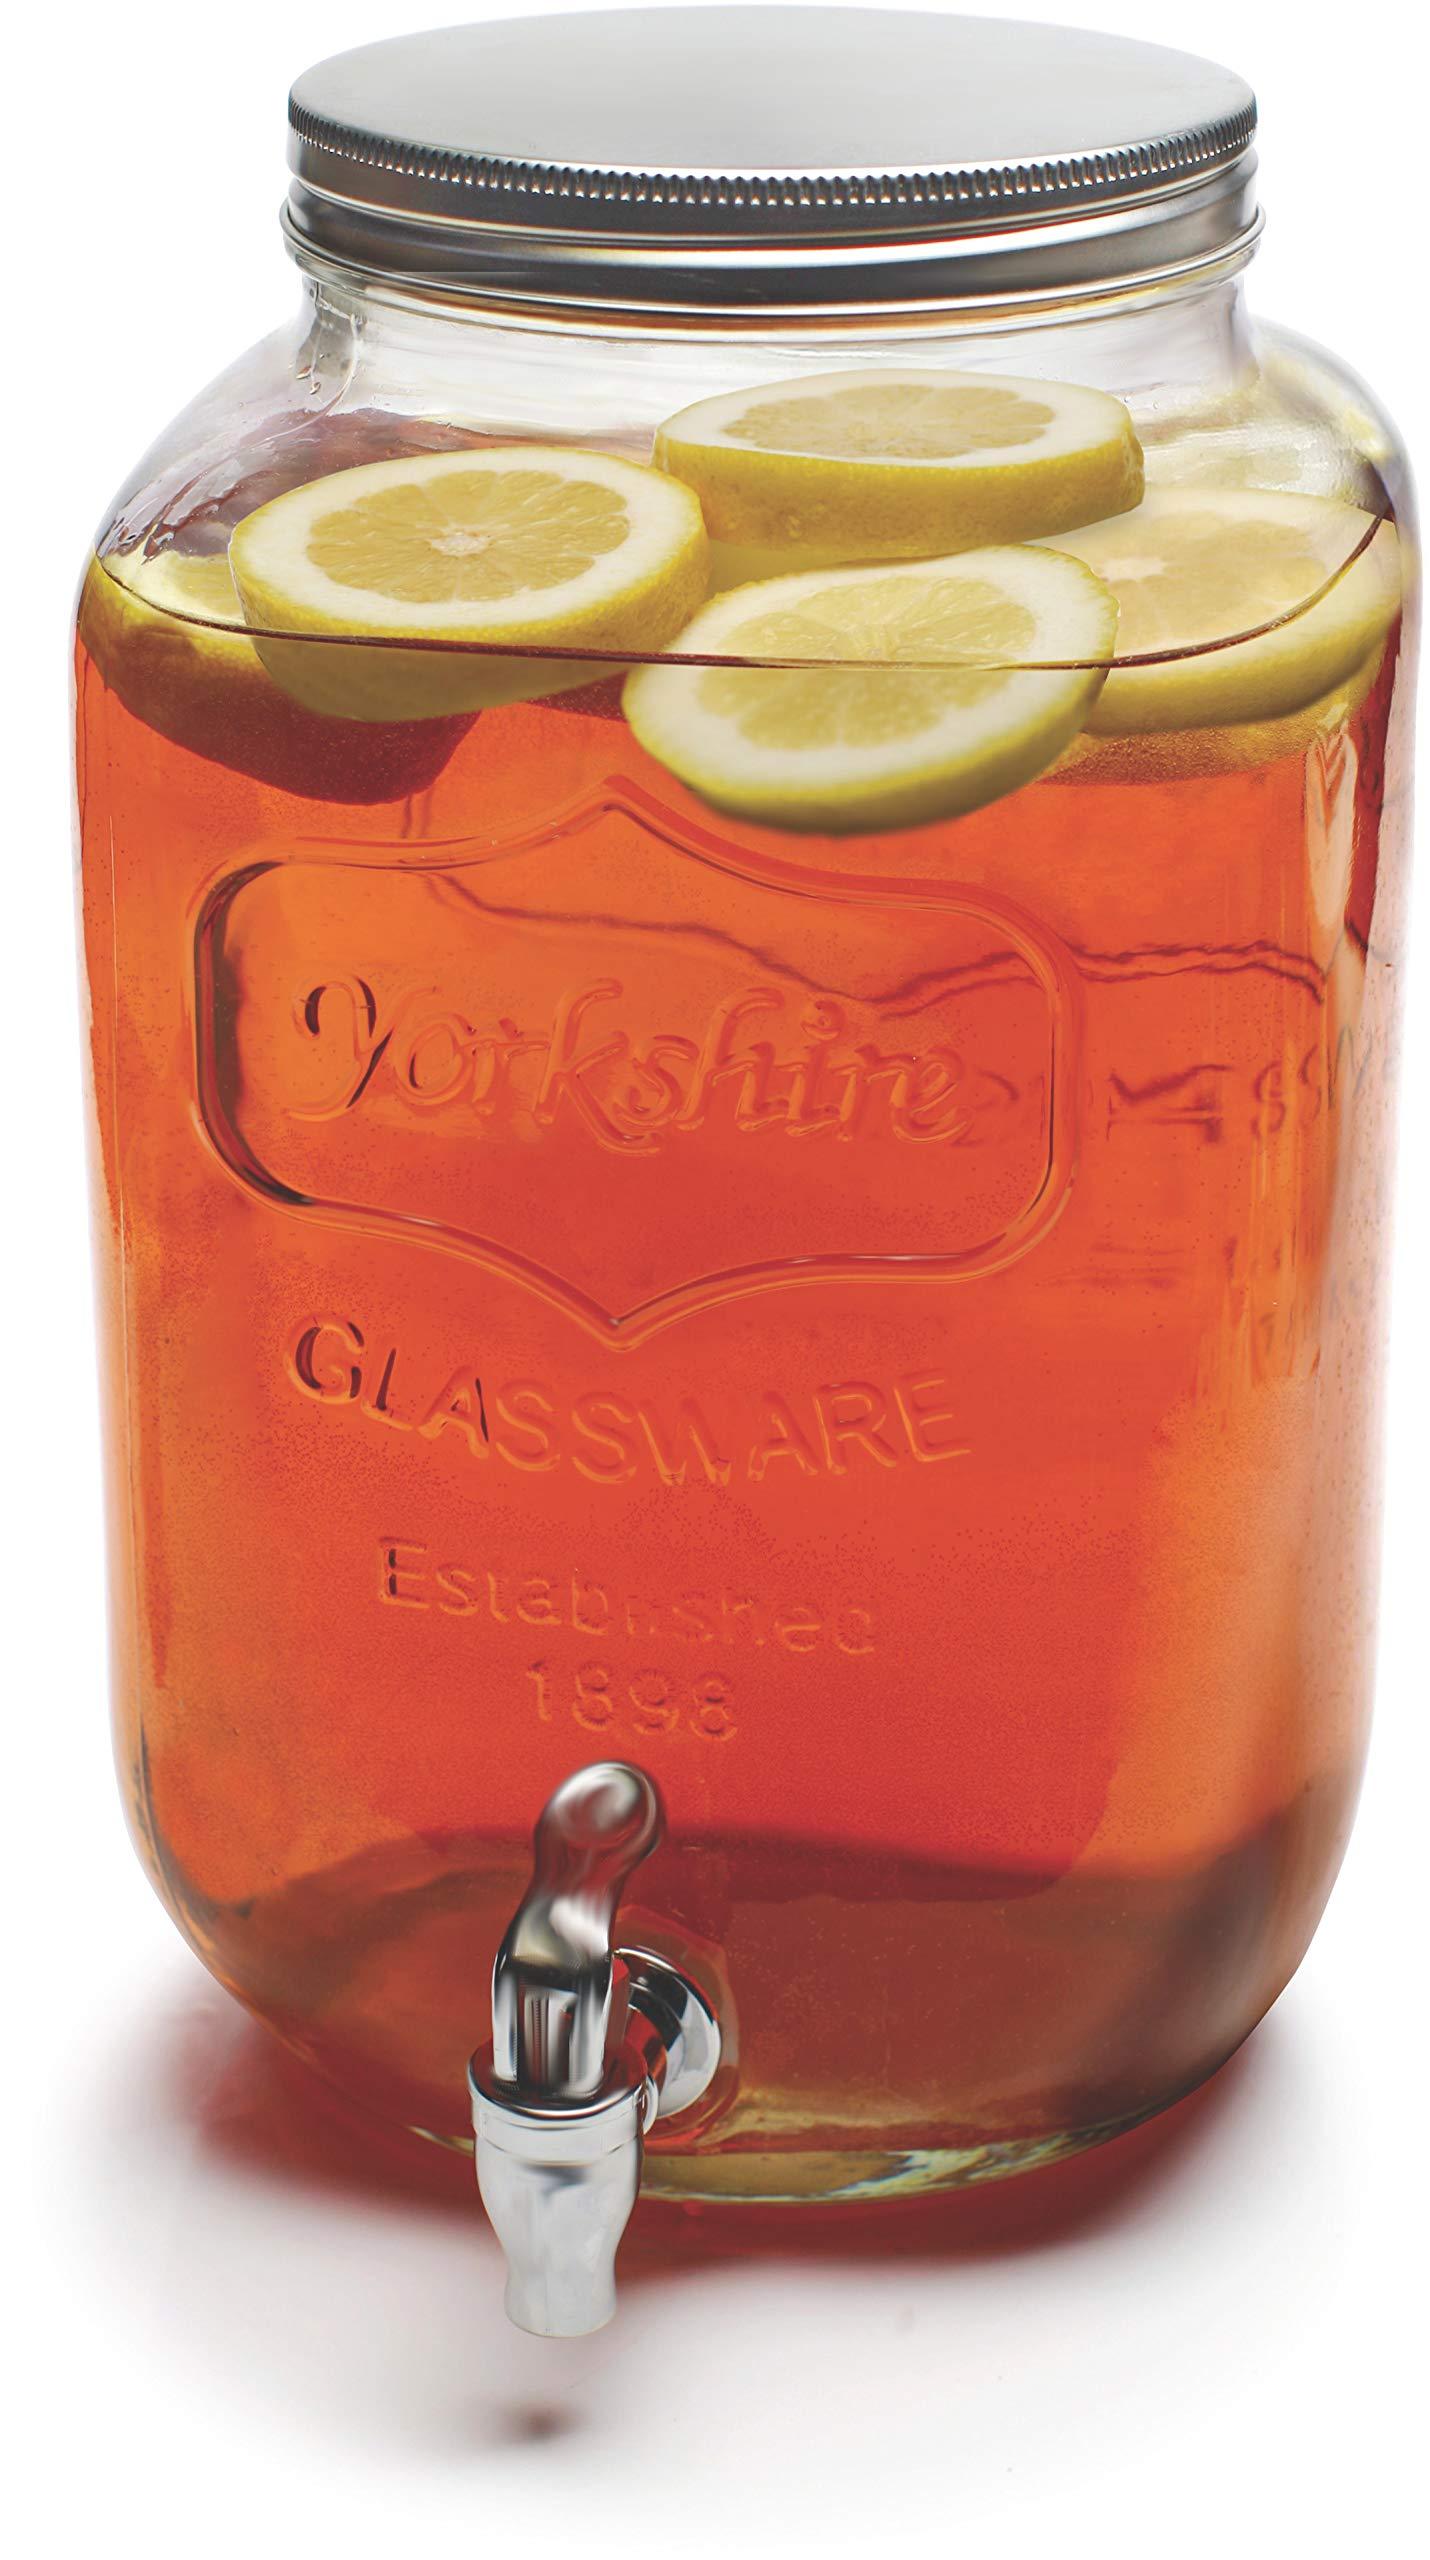 Circleware 66919 Sun Tea Mason Jar Glass Beverage Dispenser with Lid Entertainment Glassware for Water, Juice, Beer Liquor, Kombucha & Cold Drinks, 2 Gallon, Classic Yorkshire 2-Gal